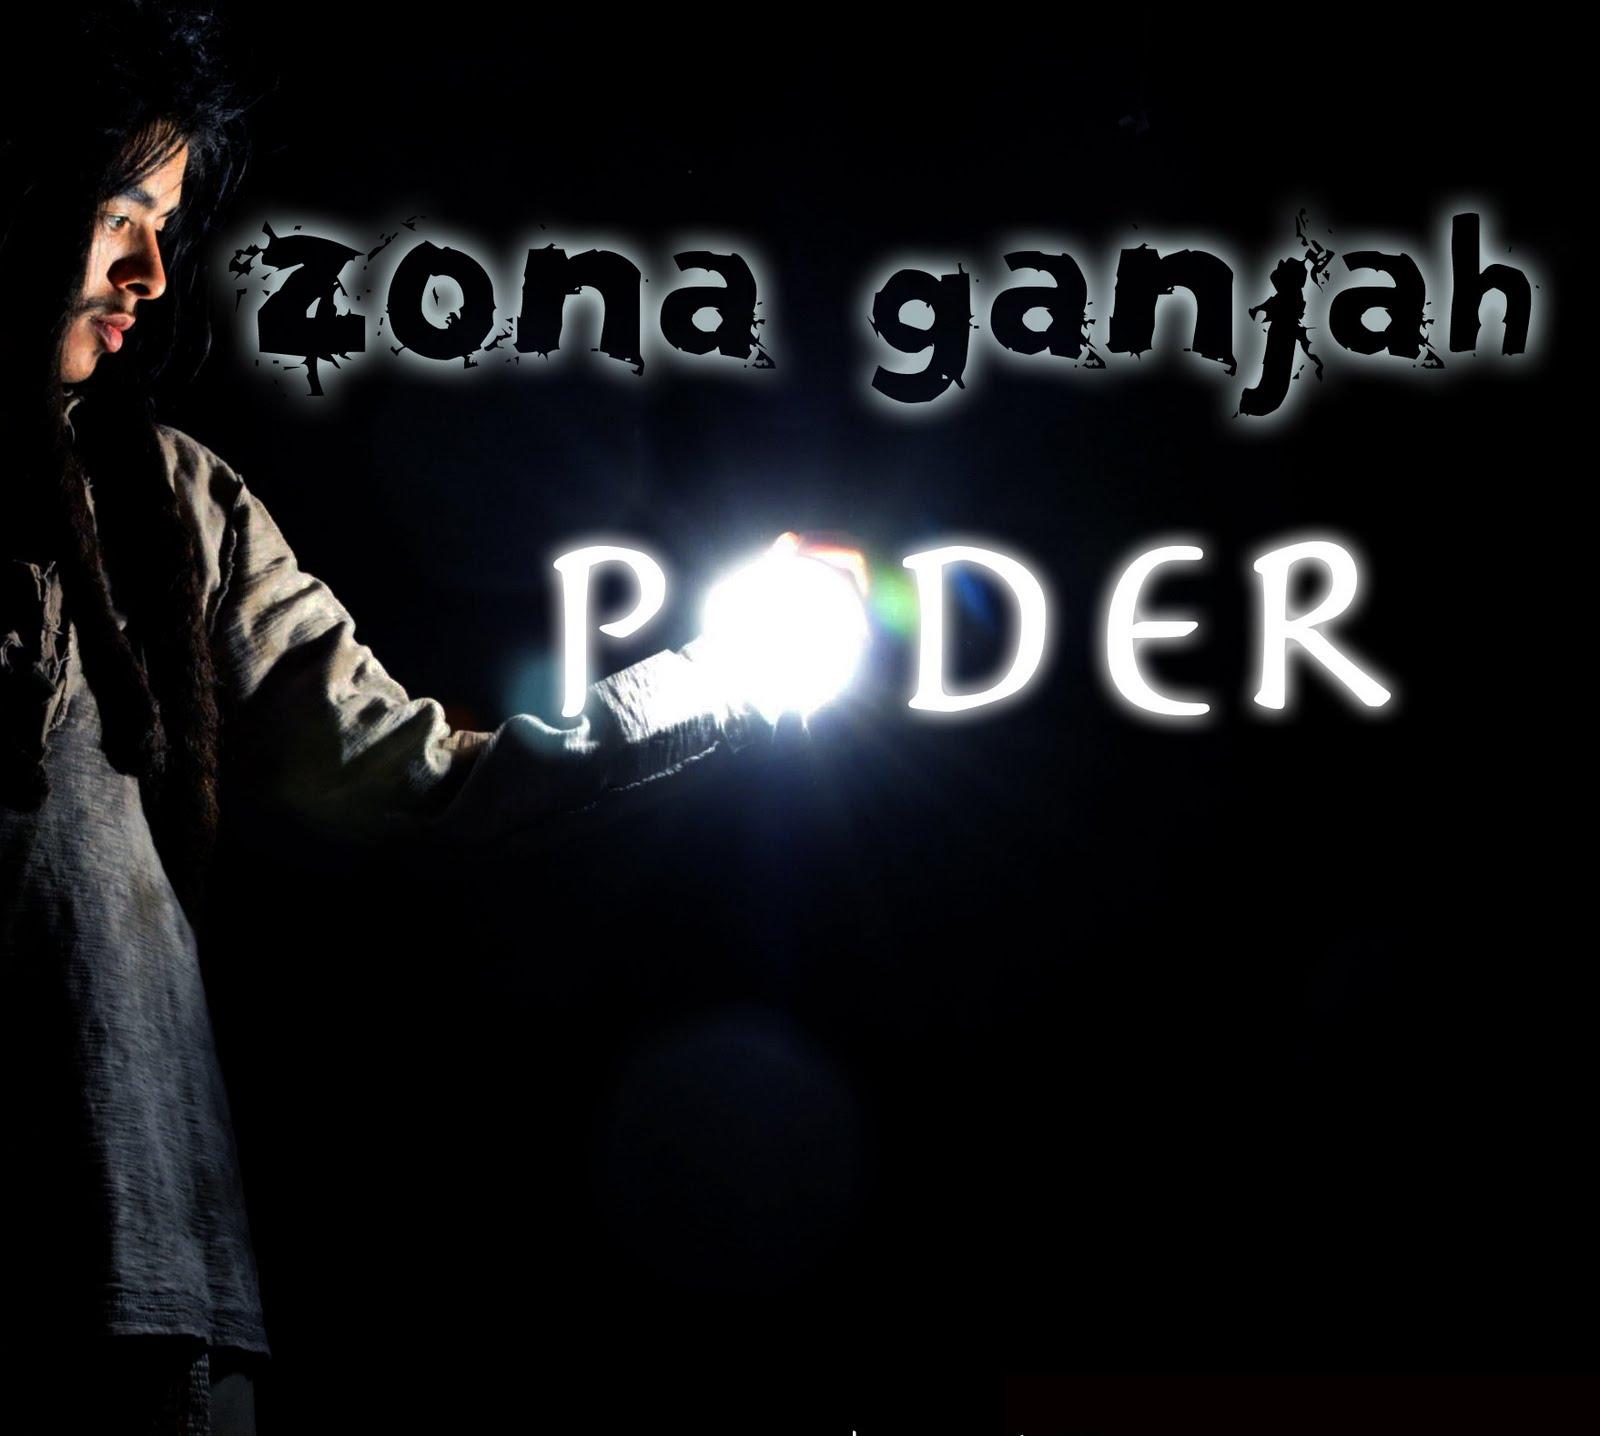 Discografia De Zona Ganjah